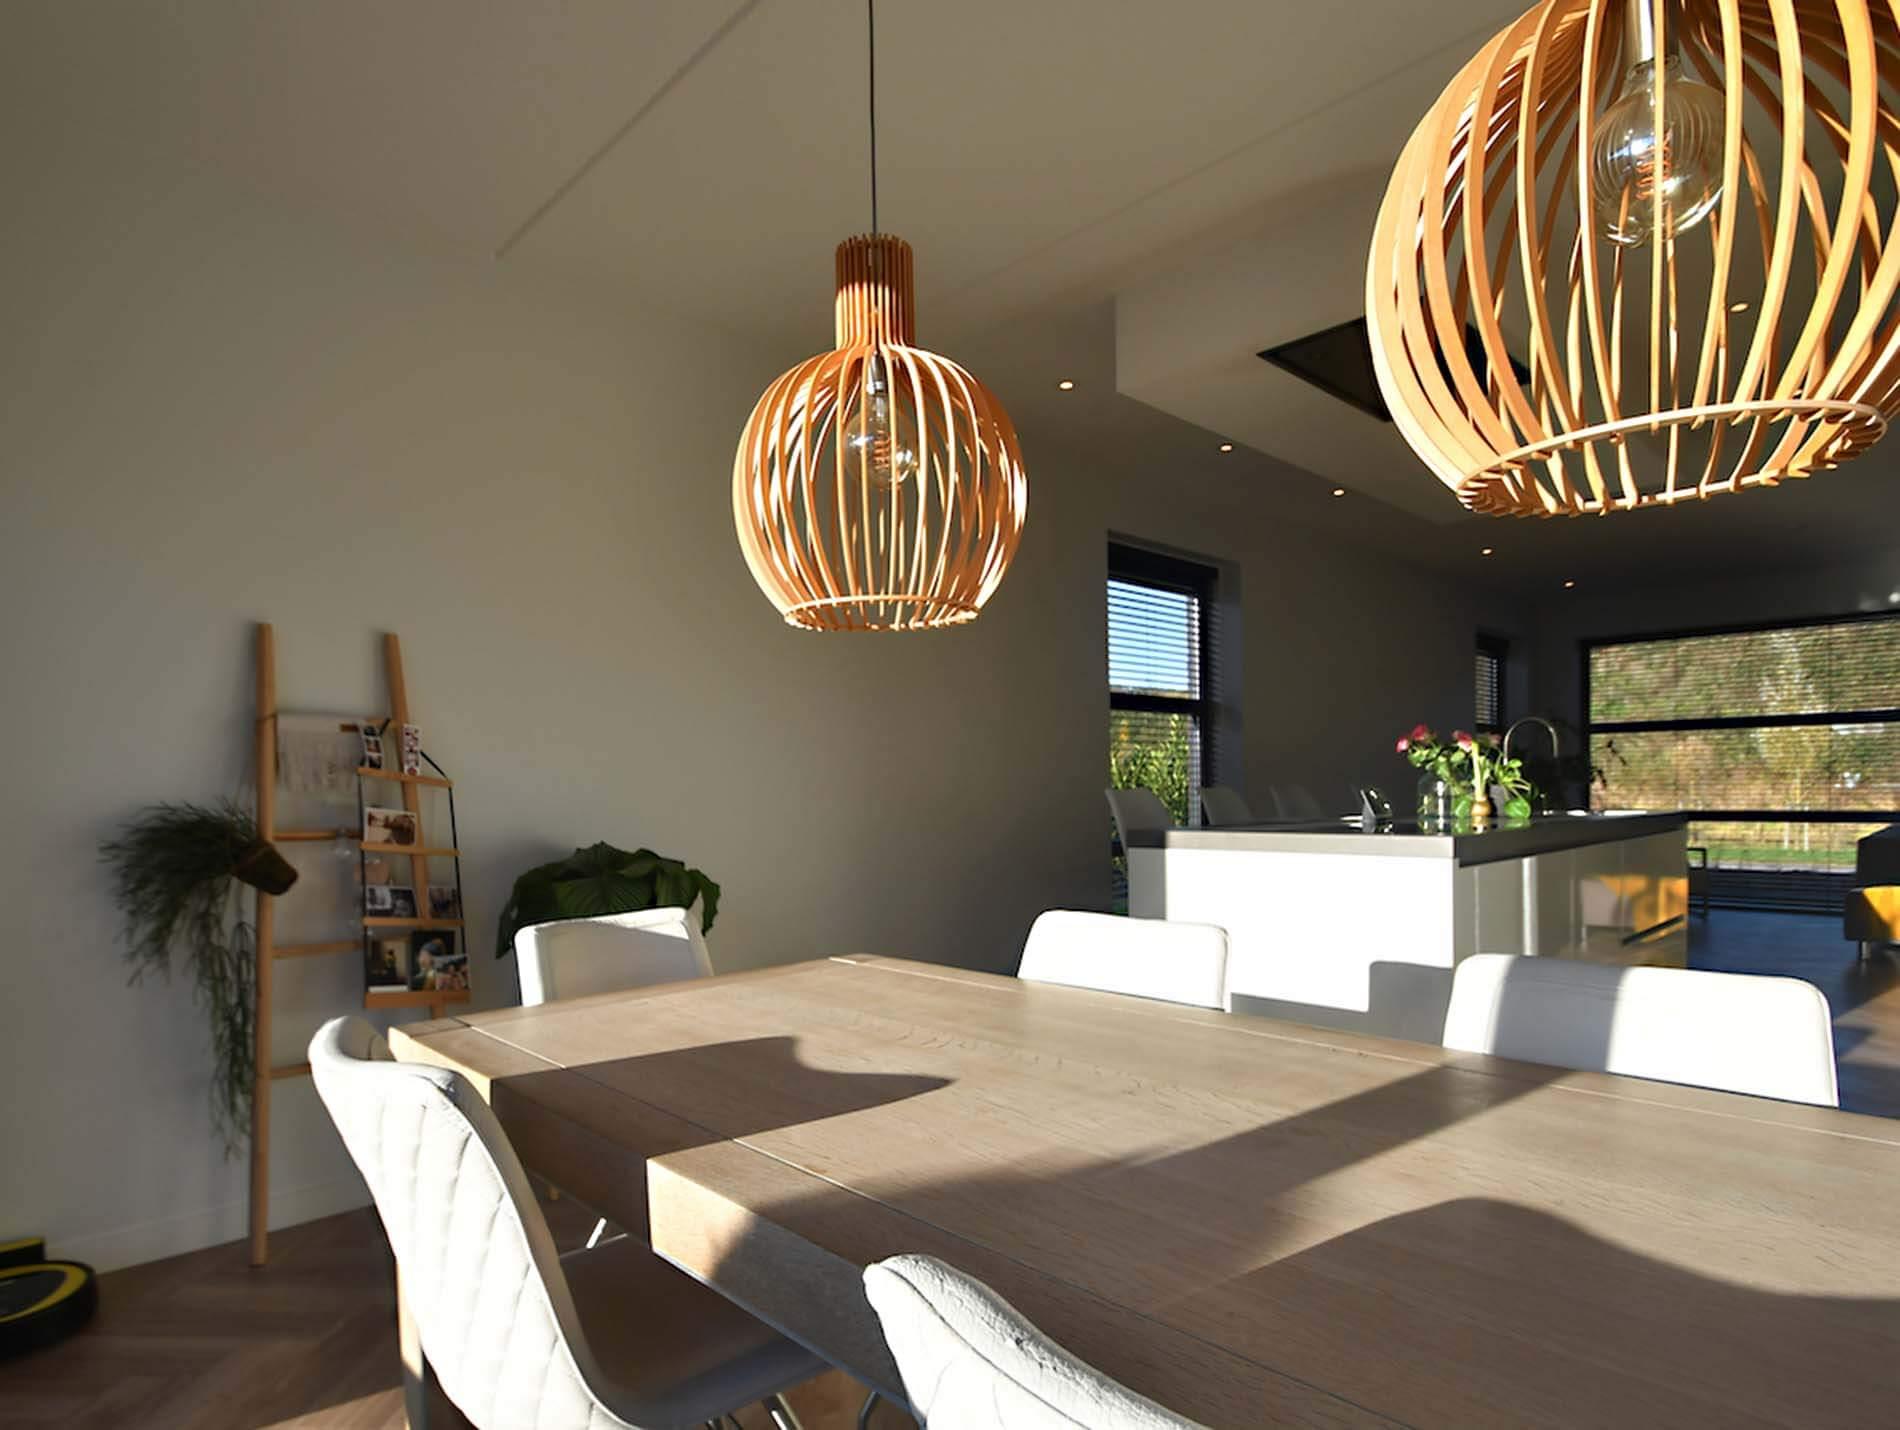 6. Interieur-drachten-nieuwbouw-woning-1900x1430p.jpg